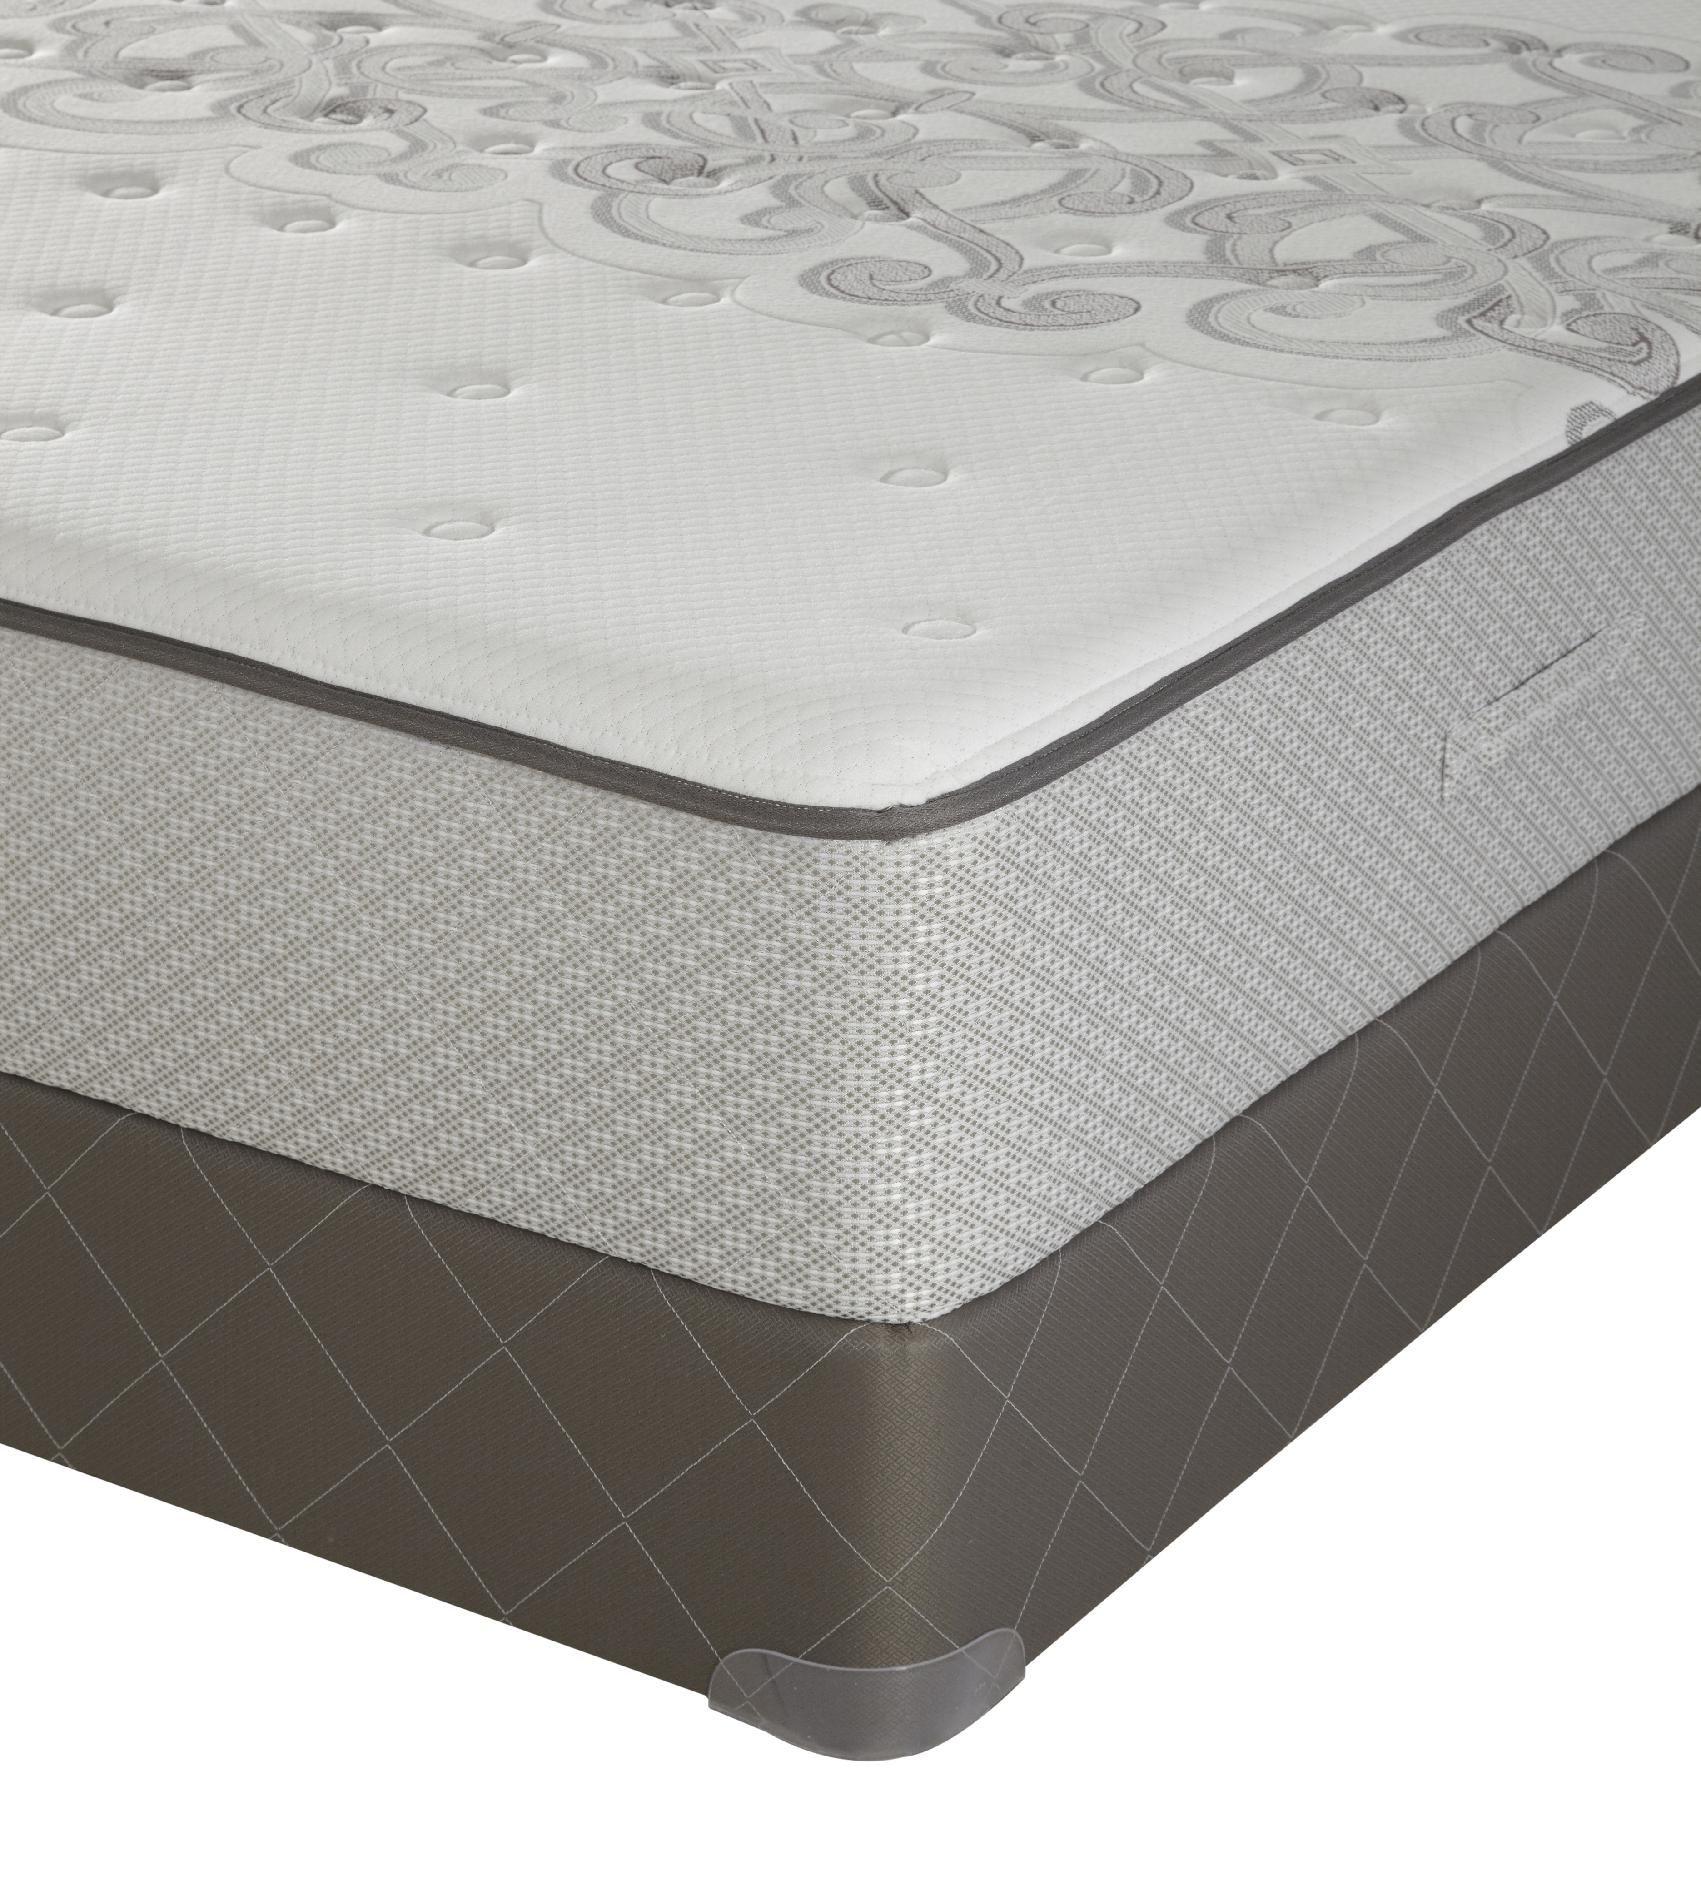 sealy posturepedic fergus falls ti2 ii ultra firm king mattress